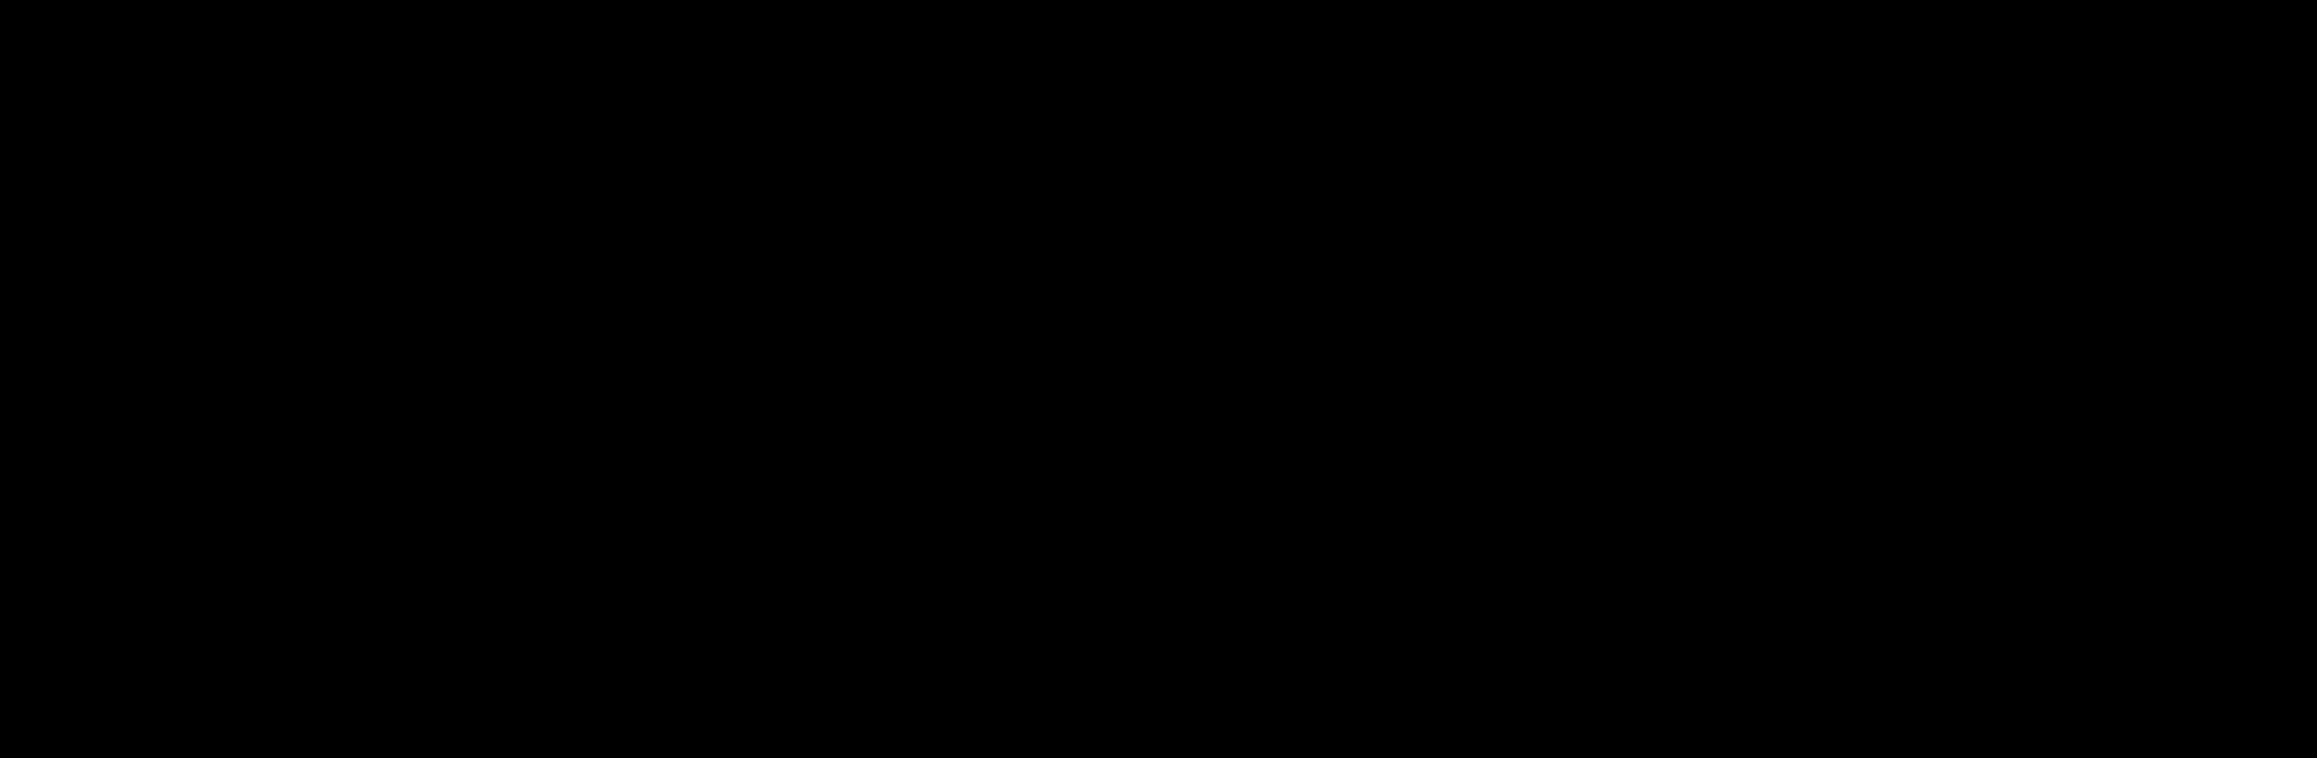 15-Hydroxy Lubiprostone Dicyclohexylammonium Salt